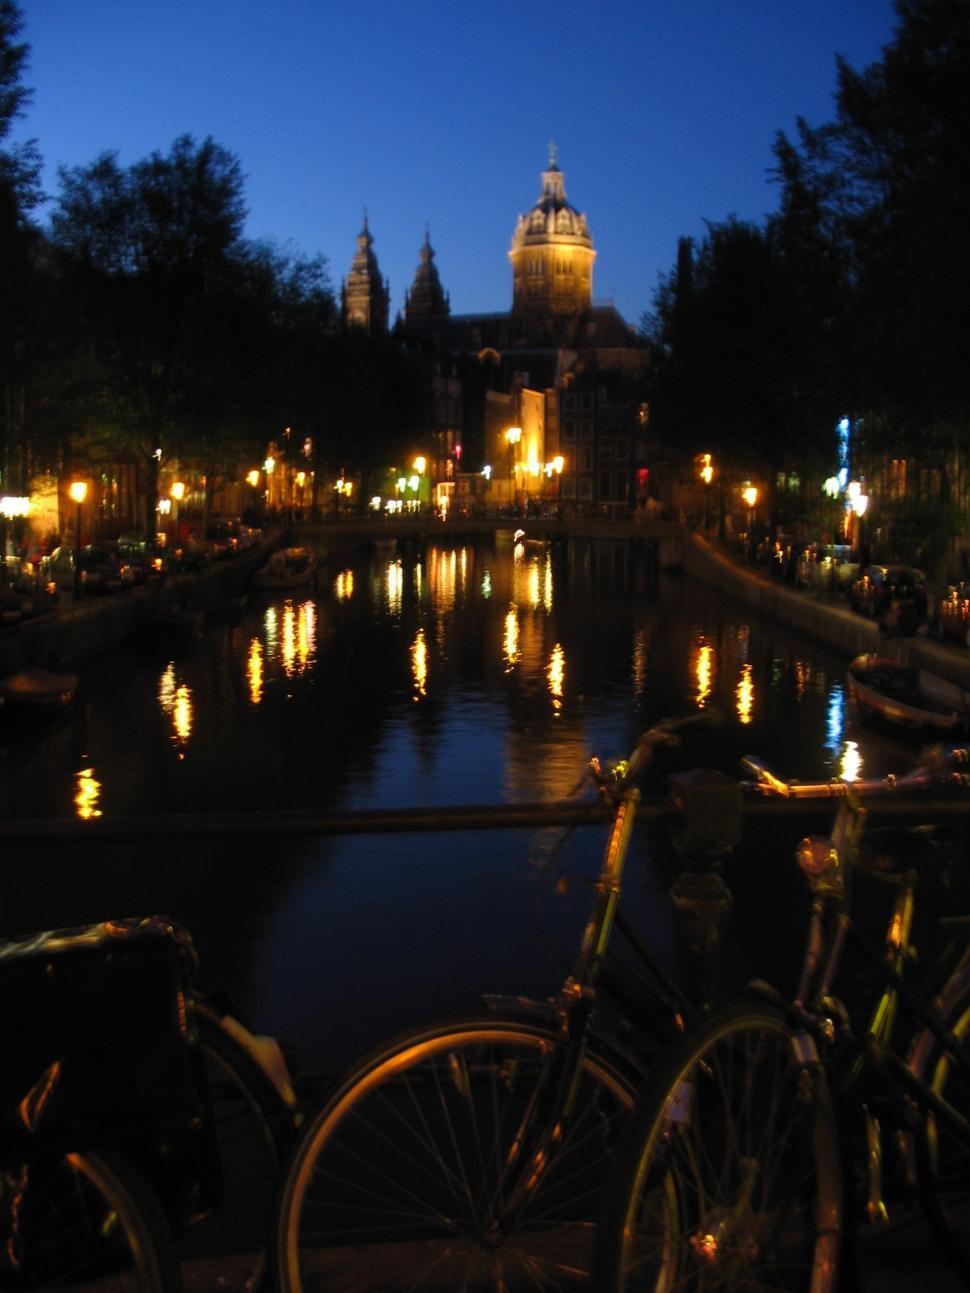 Download Free Stock Photo of Paris at night